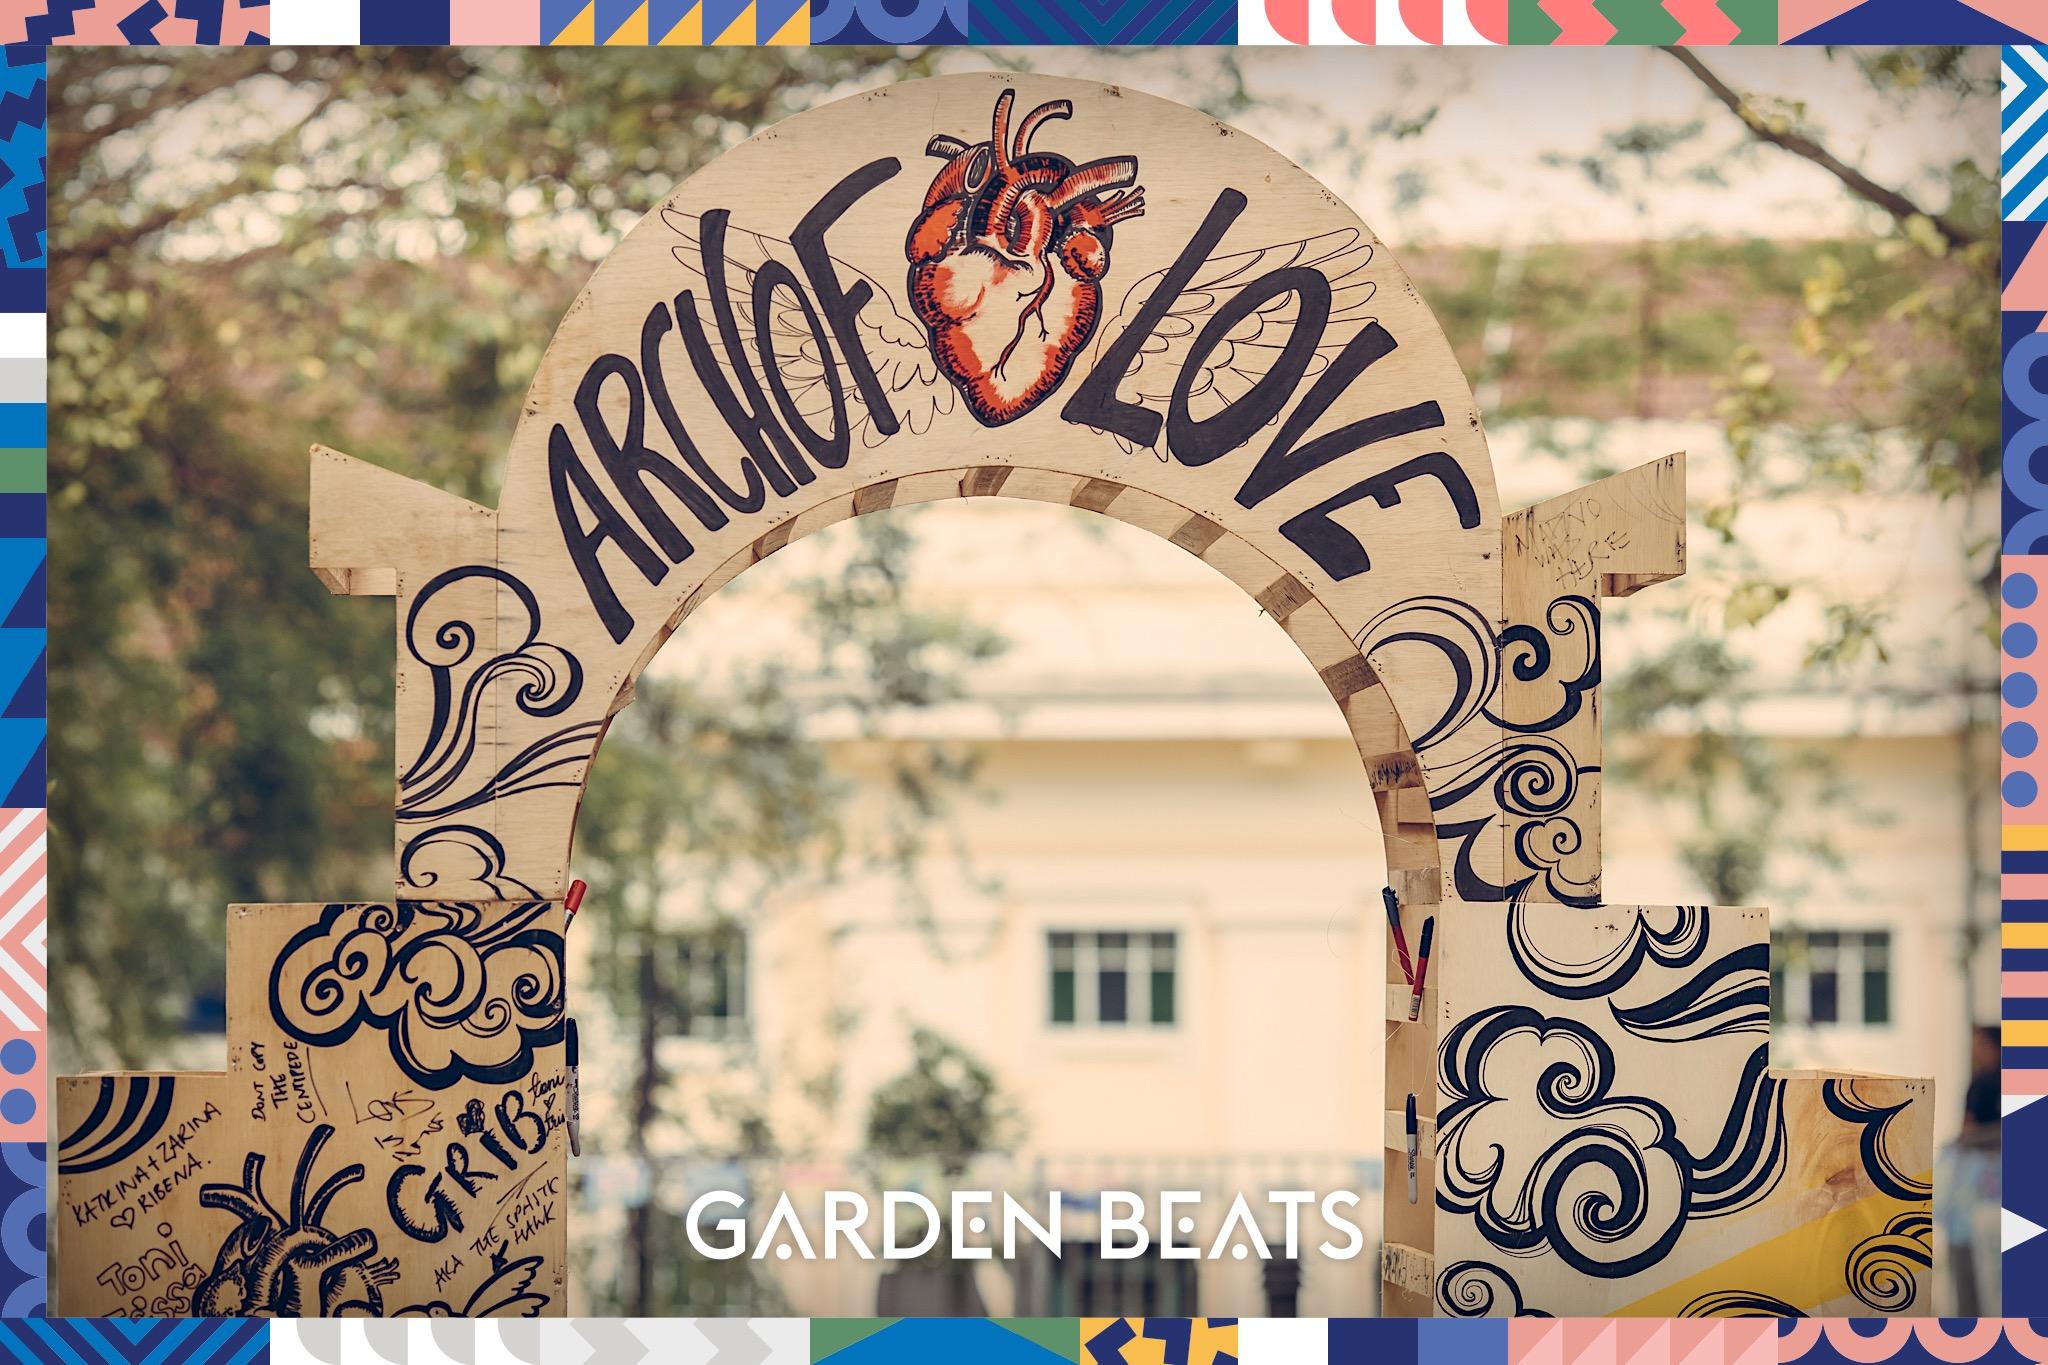 03032018_GardenBeats_Colossal076_Watermarked.jpg